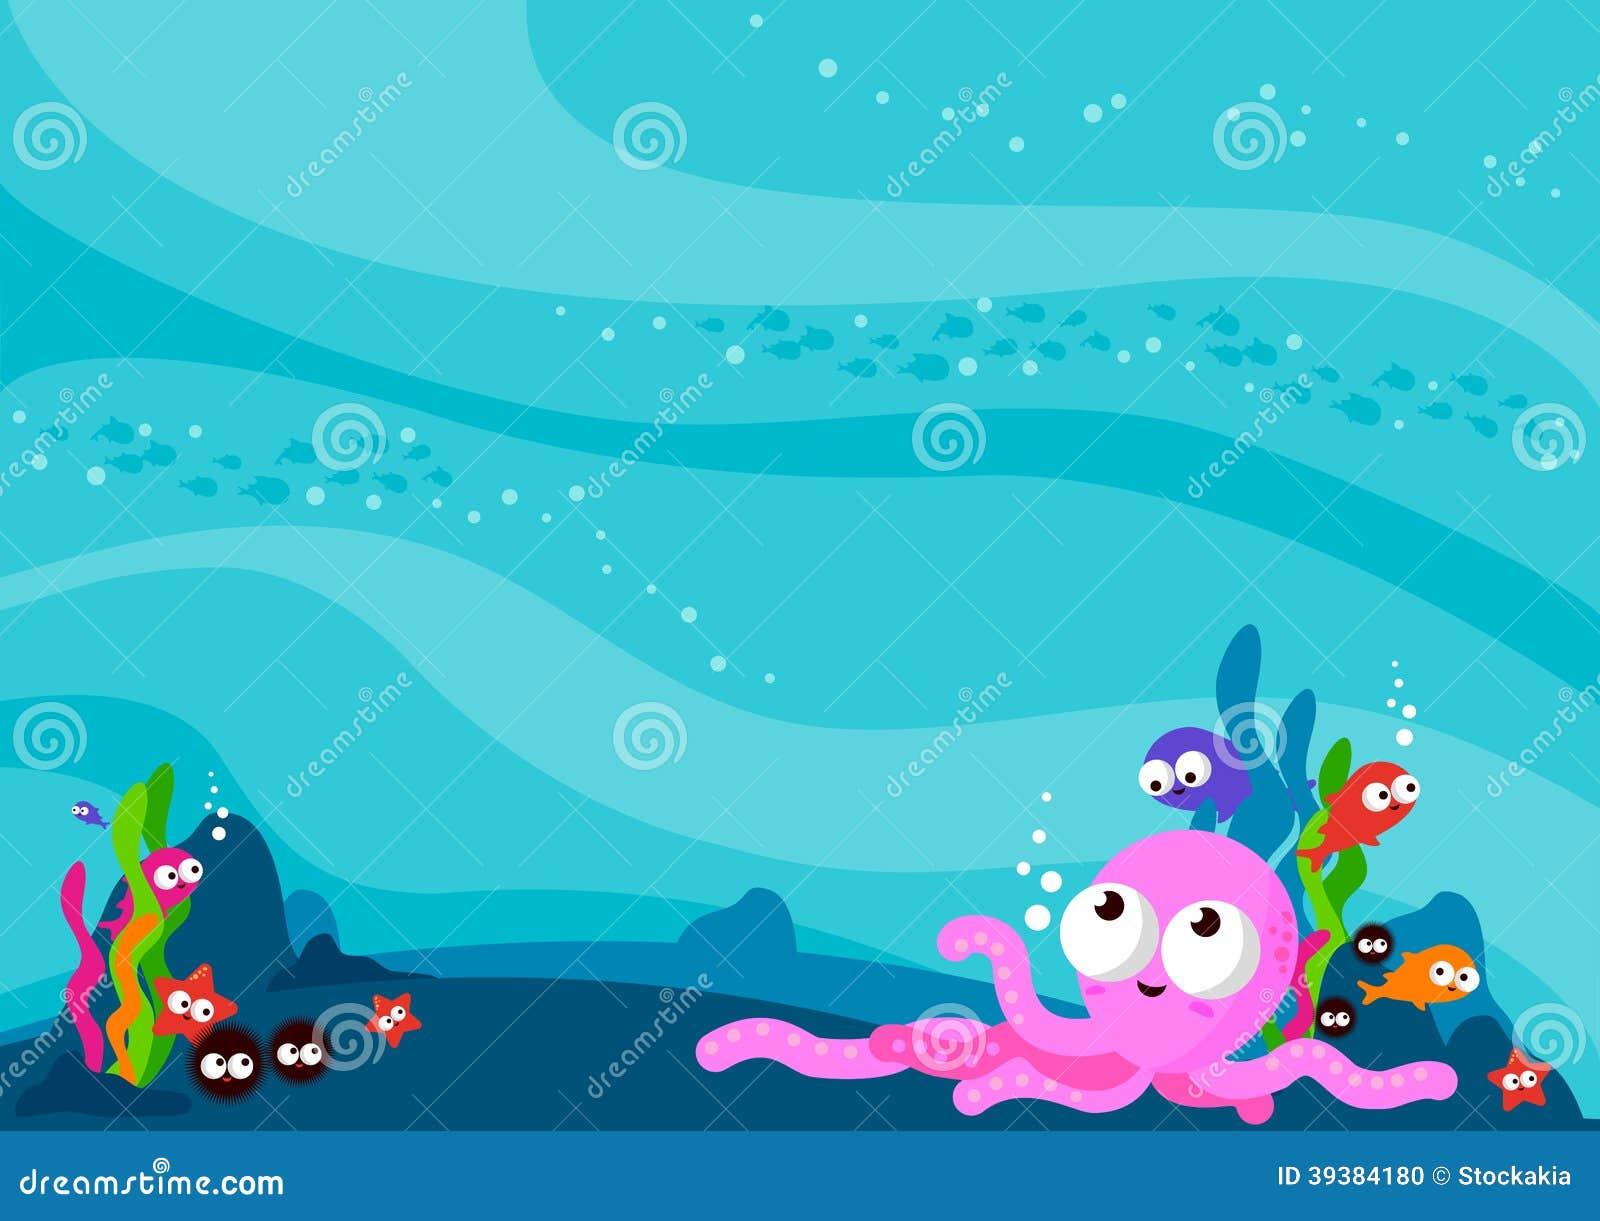 Underwater Sea Animals Background Stock Vector - Image ...